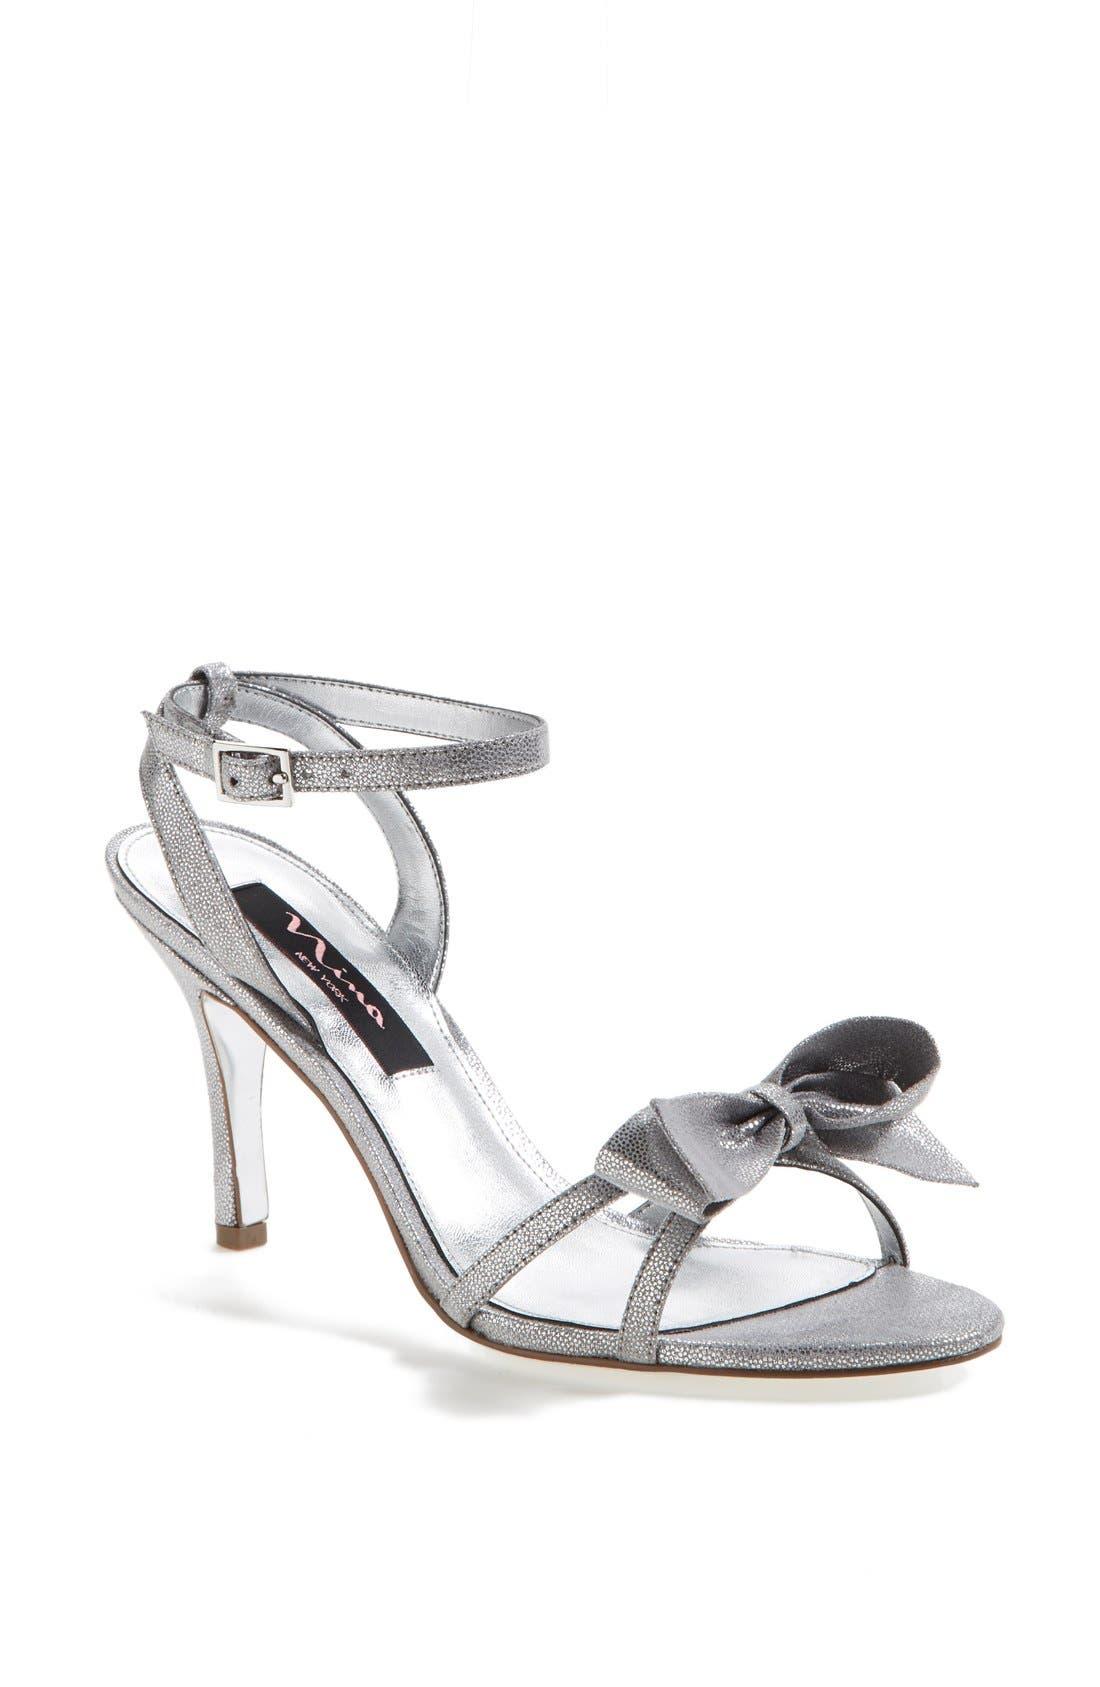 Alternate Image 1 Selected - Nina 'Vianna' Satin Bow Sandal